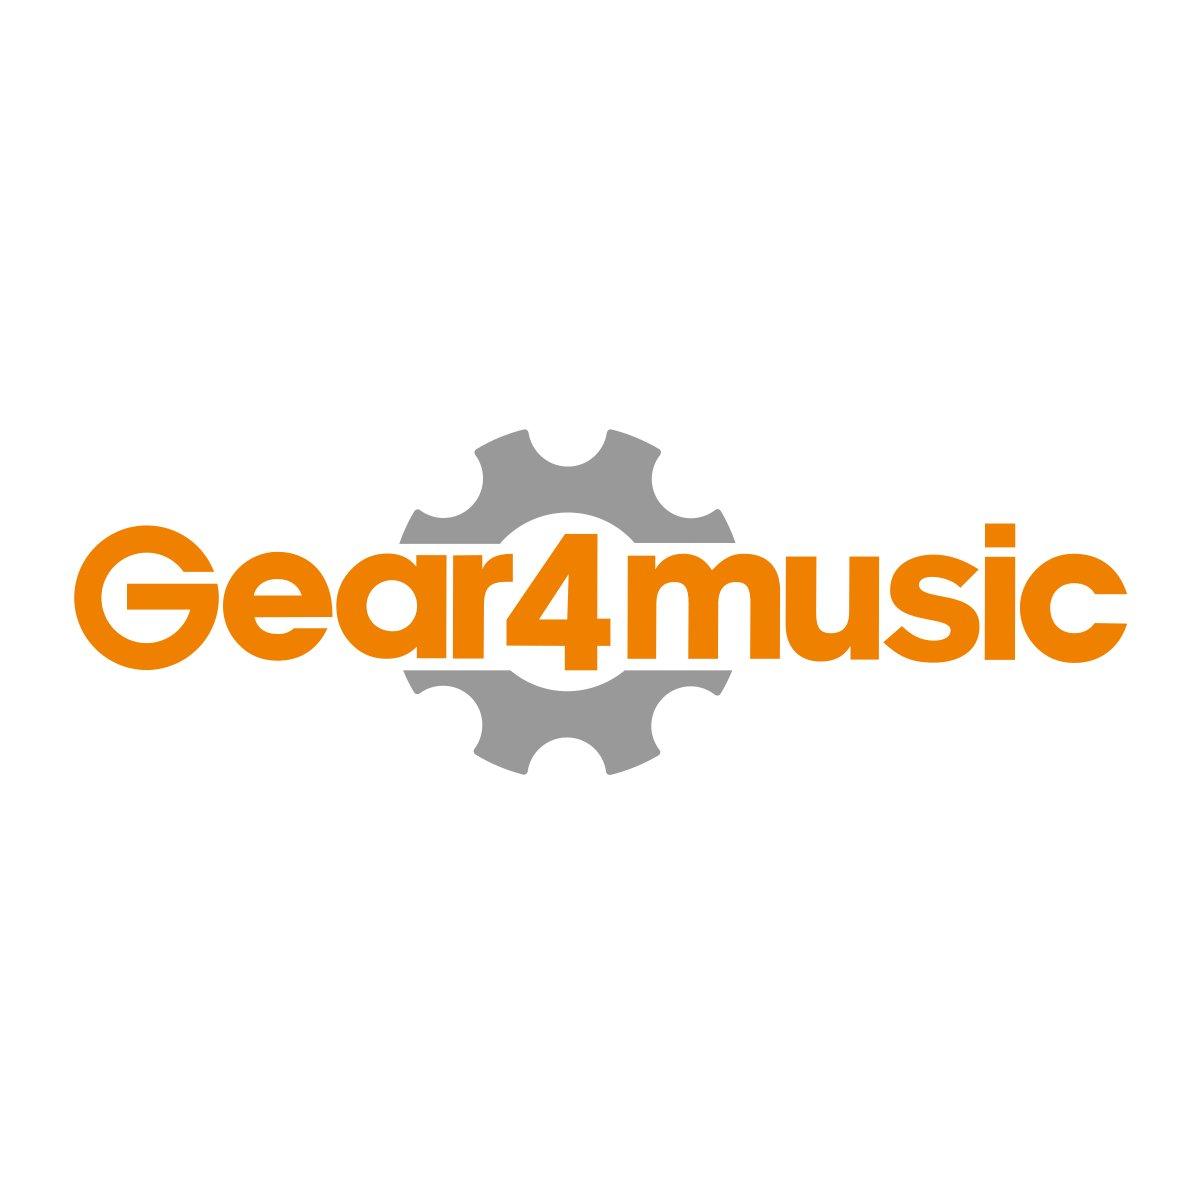 2U 19 inch Rack Bag by Gear4music at Gear4music.com